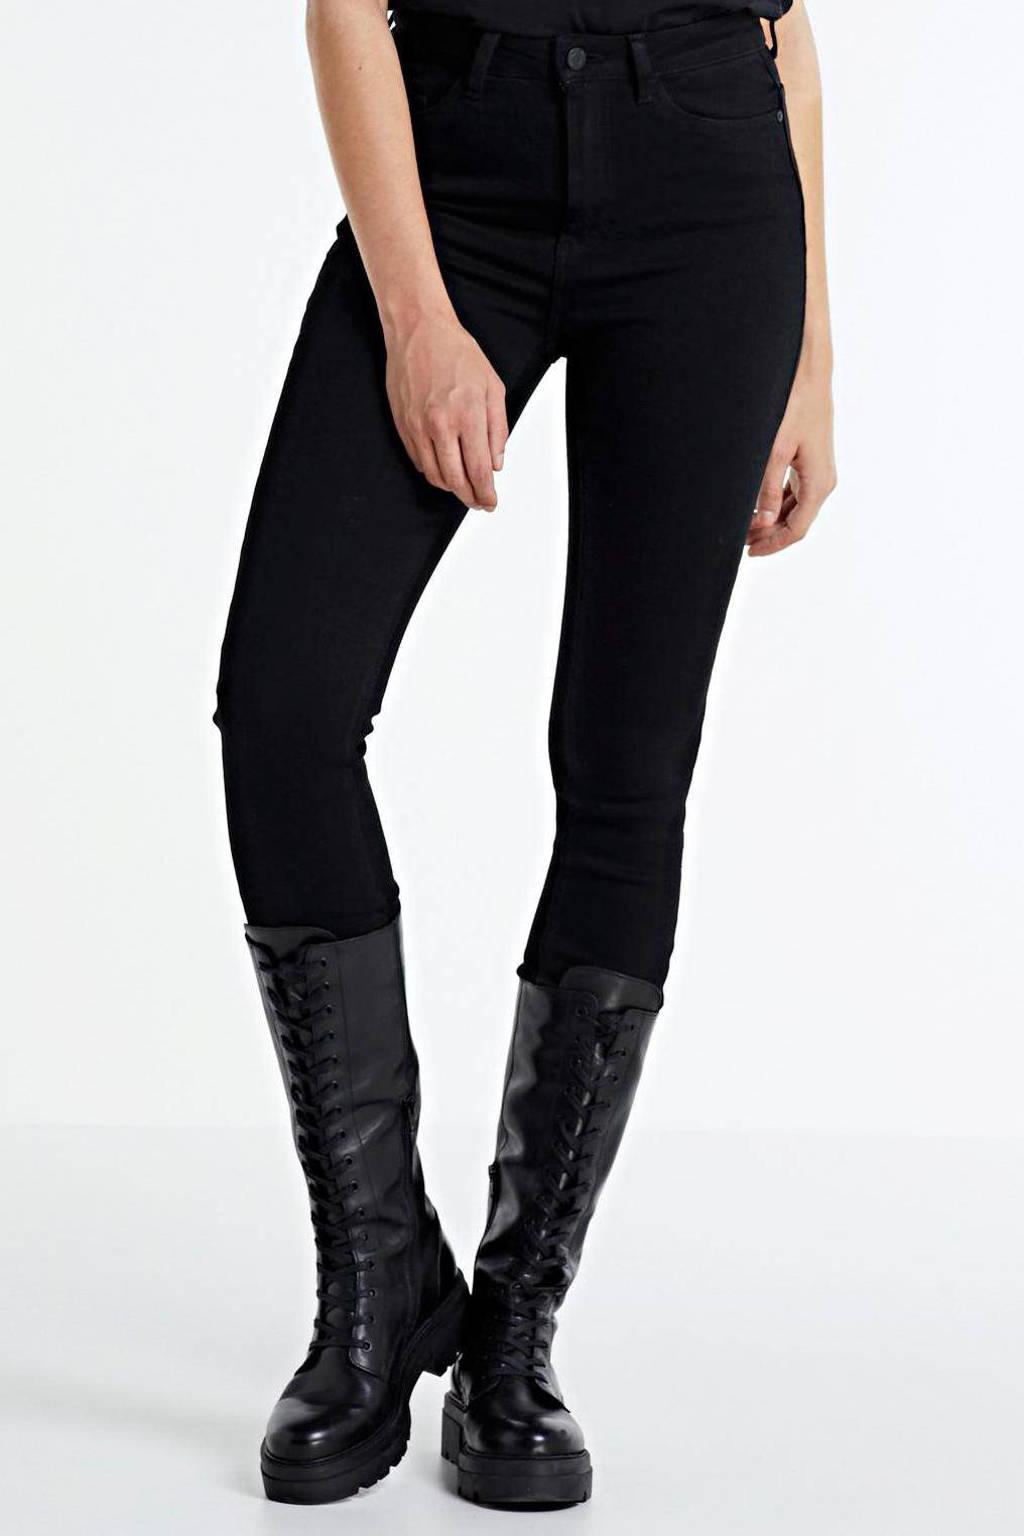 NOISY MAY high waist skinny jeans NMCALLIE met biologisch katoen zwart, Zwart